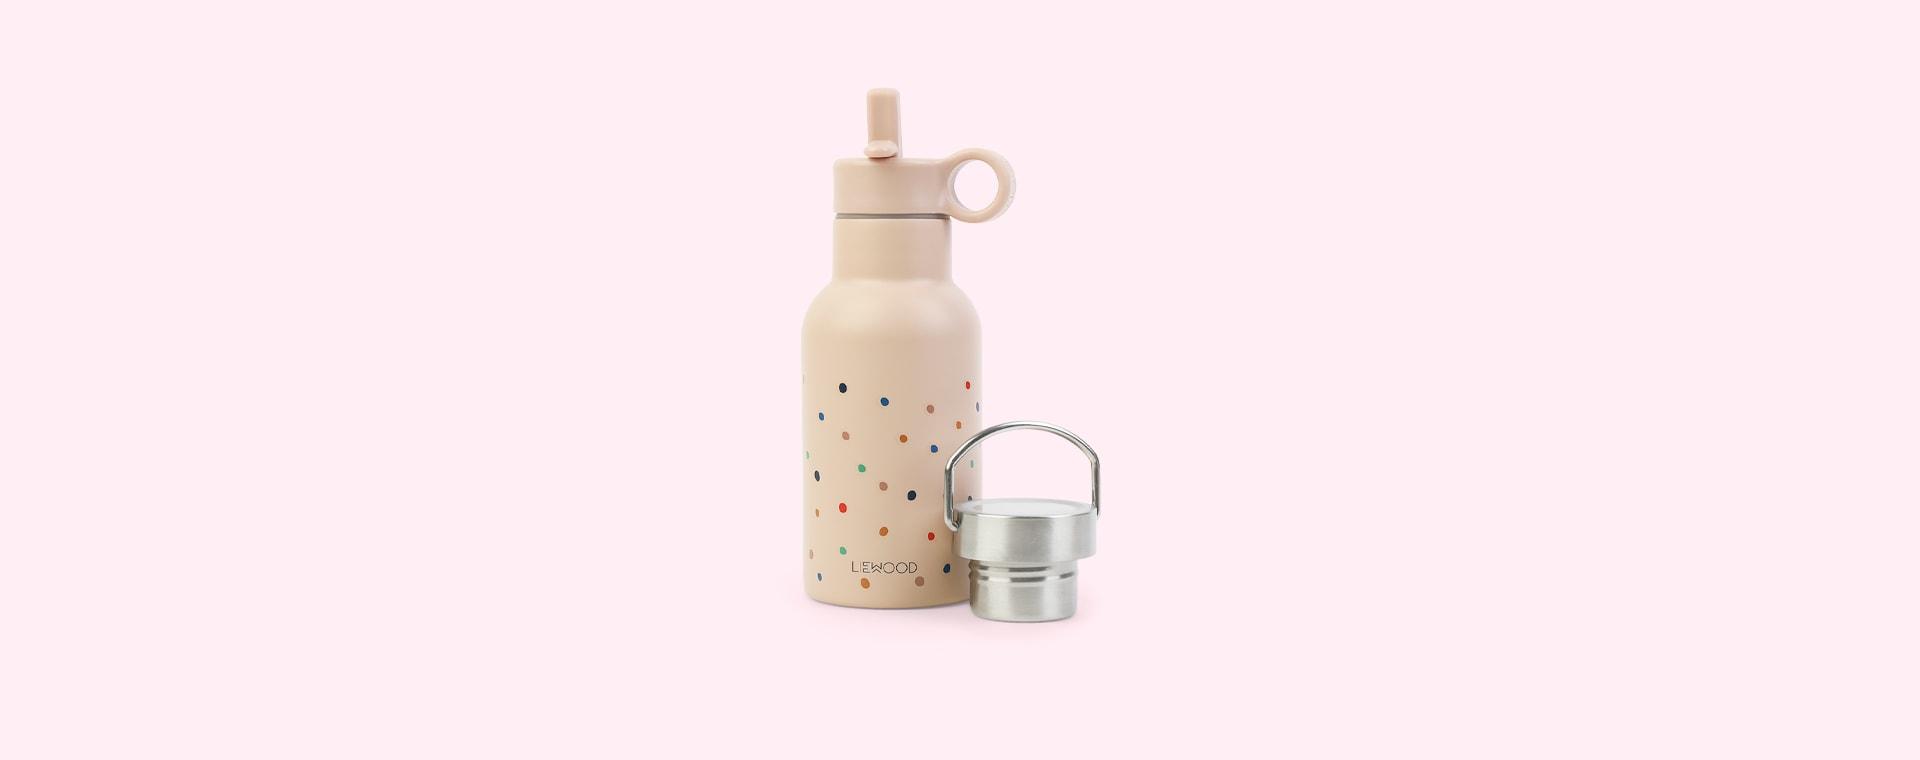 Confetti mix Liewood Anker Water Bottle